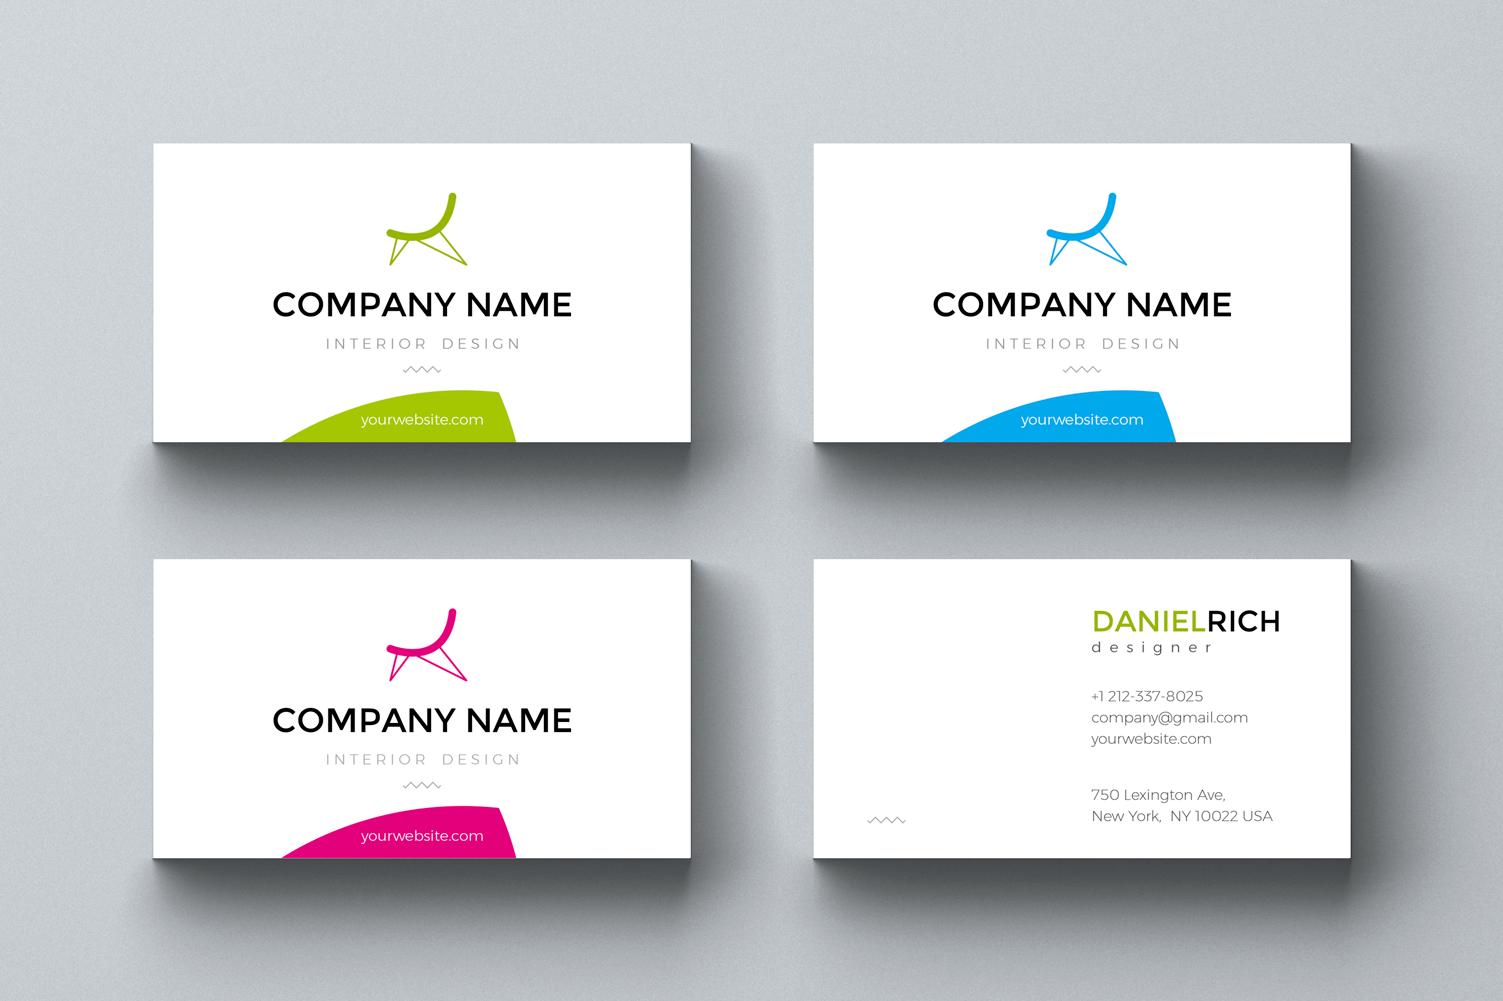 Daniel. Business card template